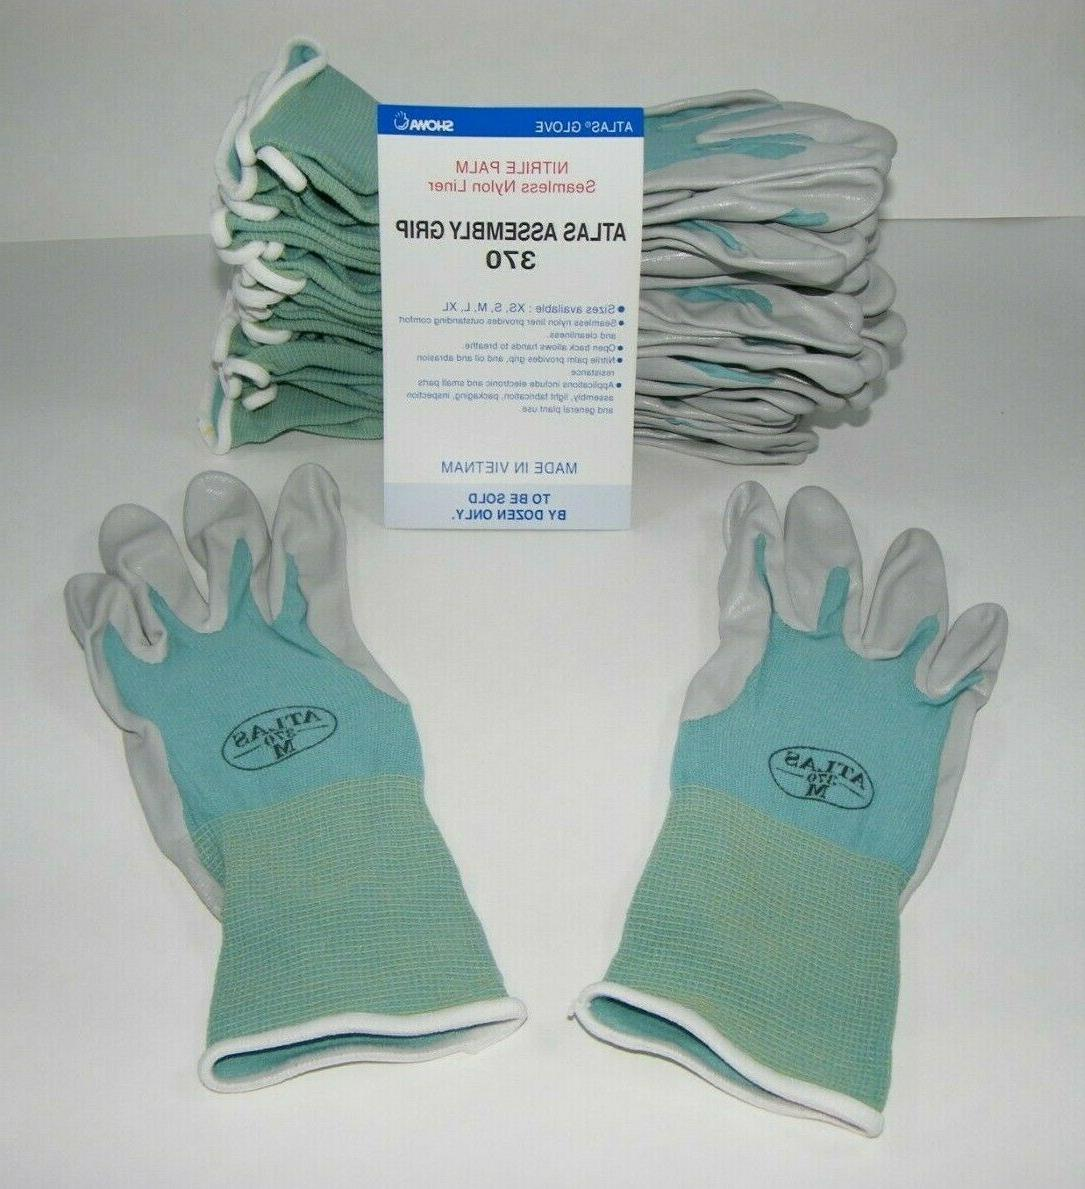 atlas 370 nitrile rubber palms work gloves